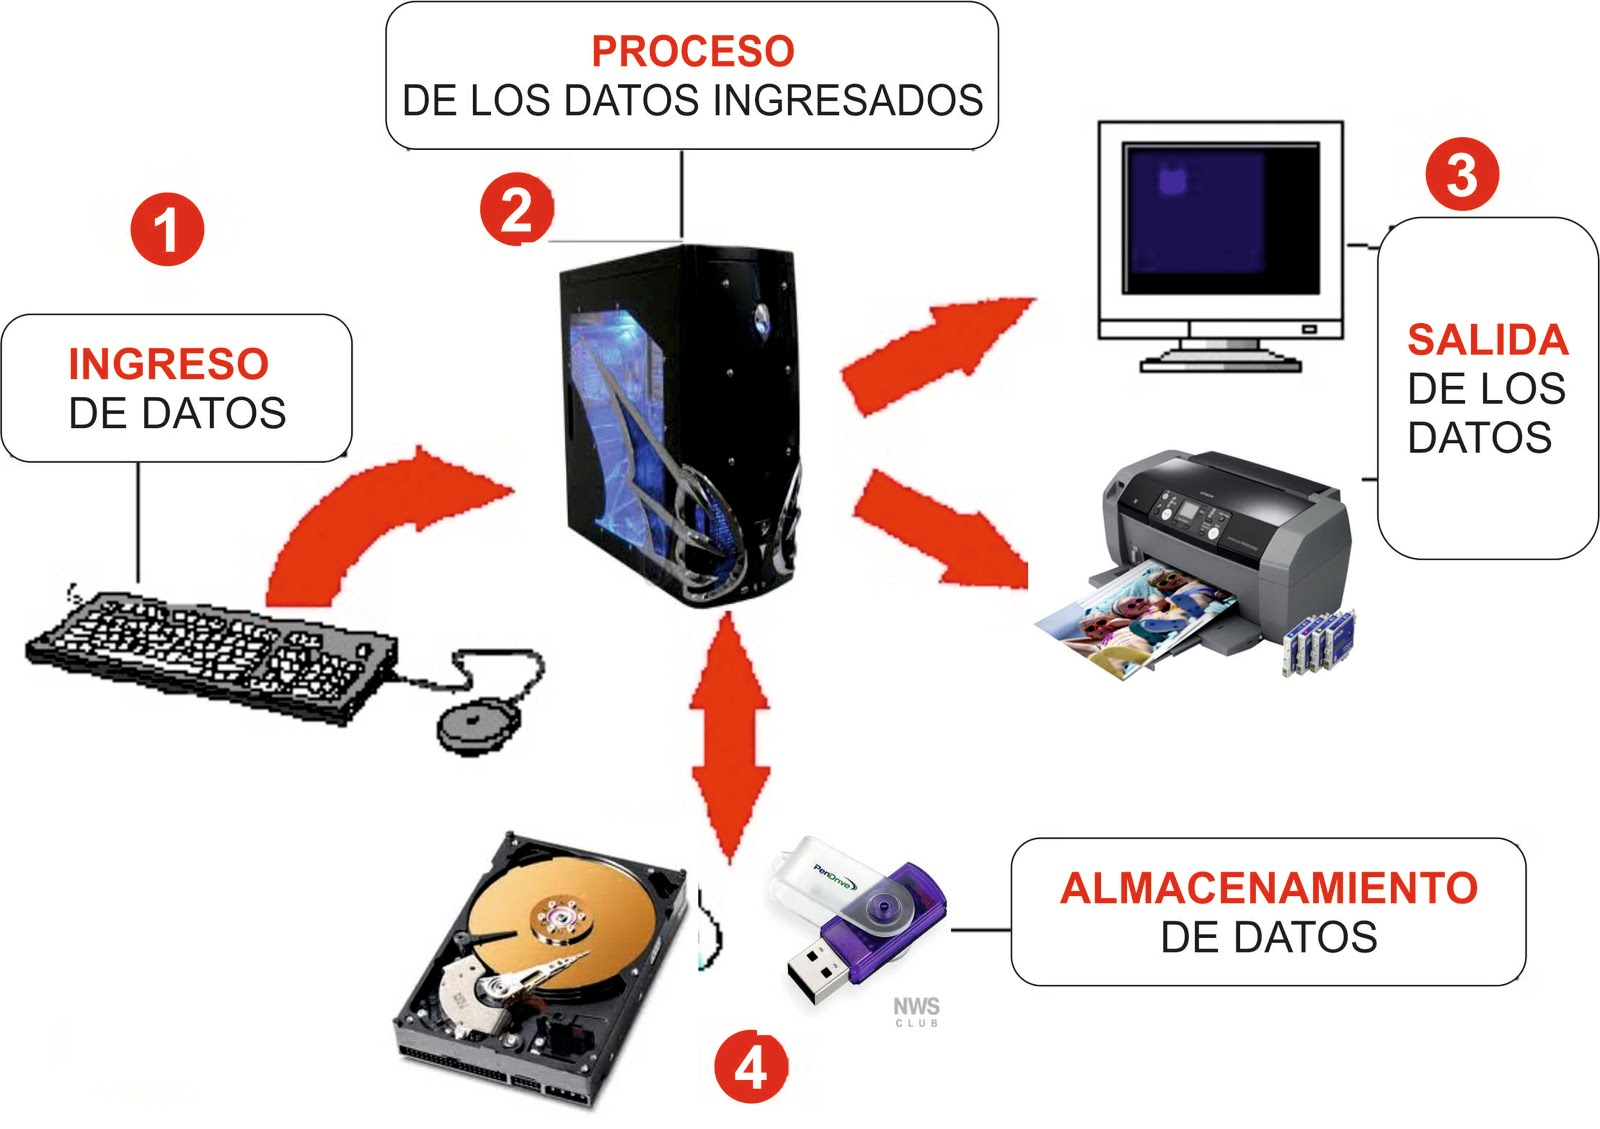 procesamiento informacion computadora: